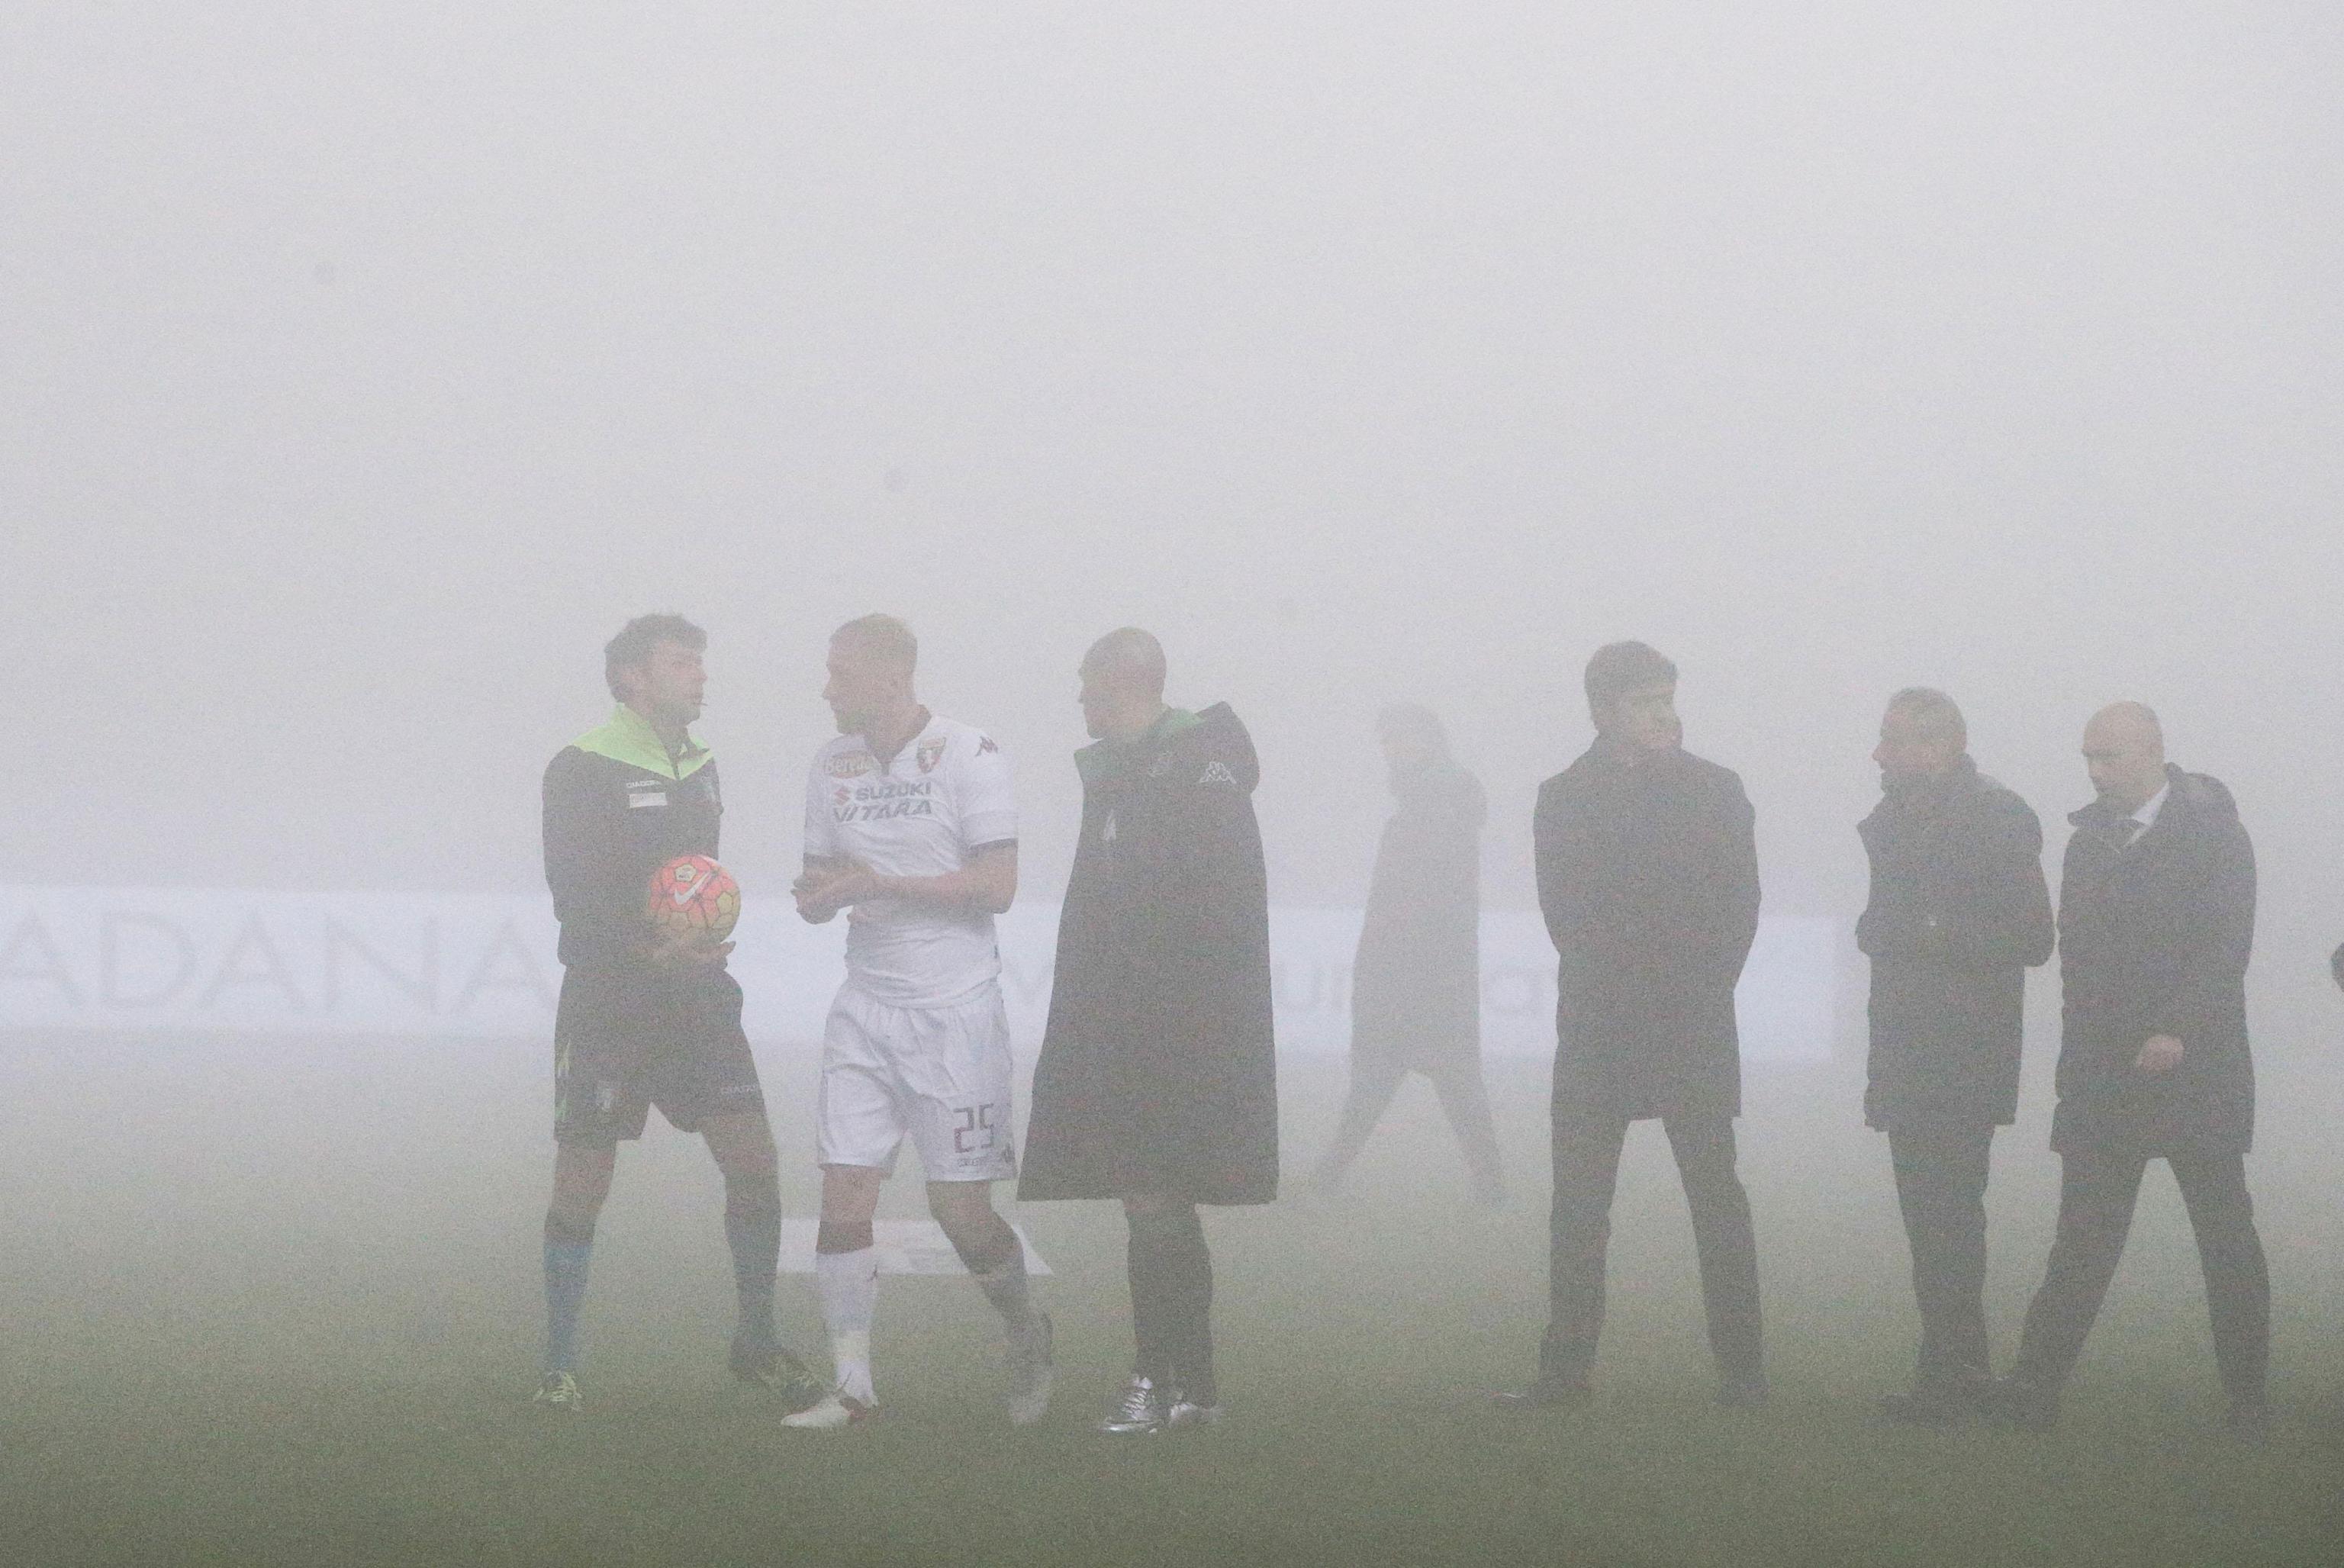 Soccer: Serie A; Sassuolo vs Torino FC